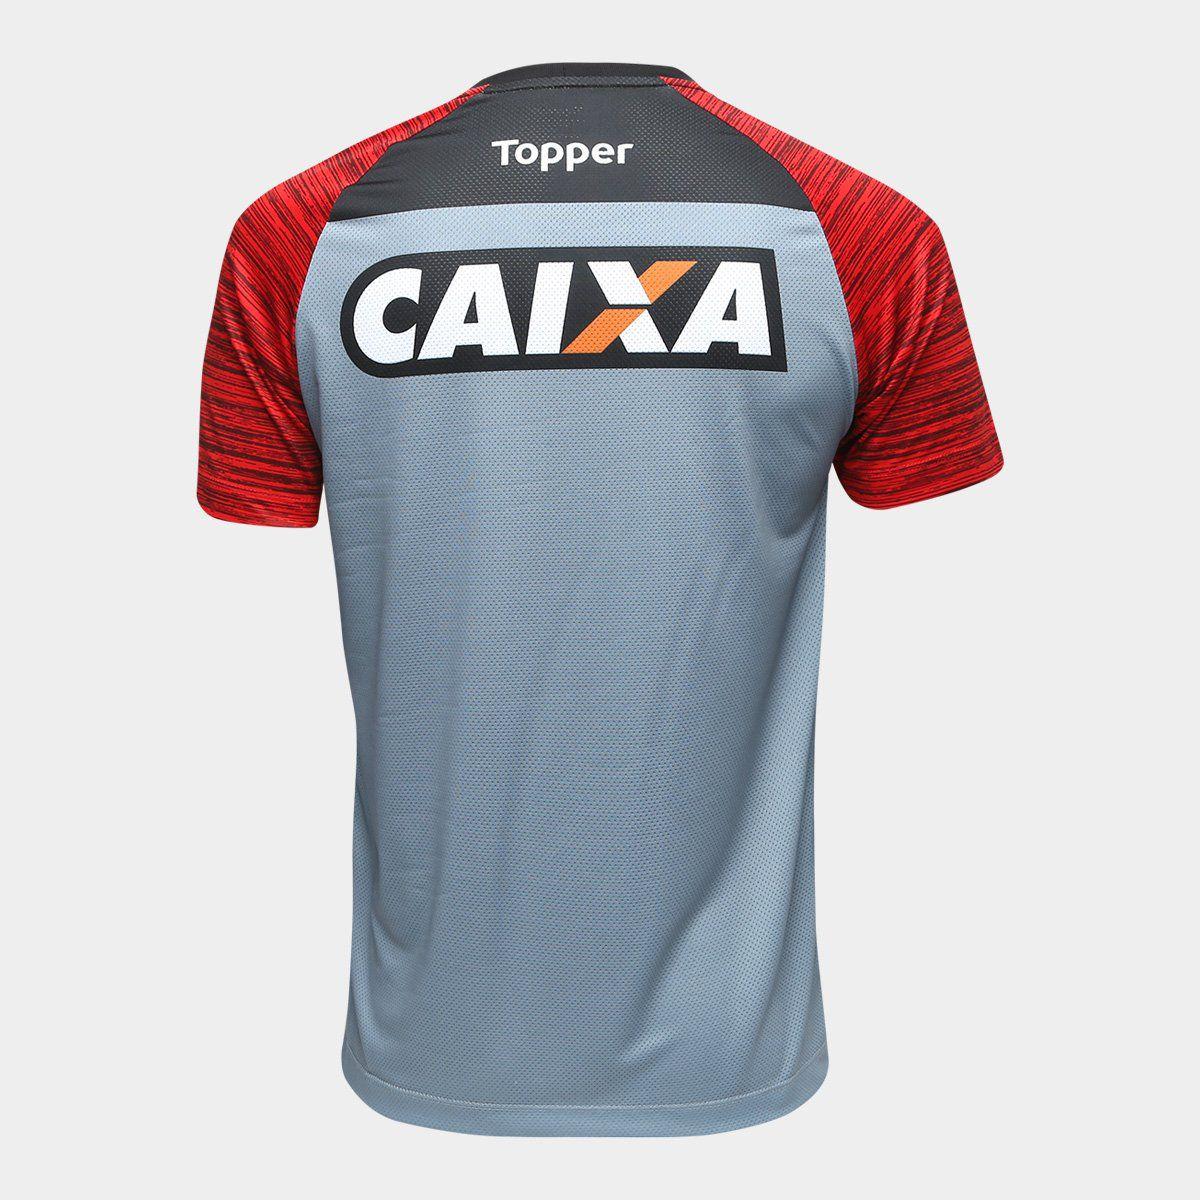 Camisa Treino Atleta Topper - 2018 - Cinza